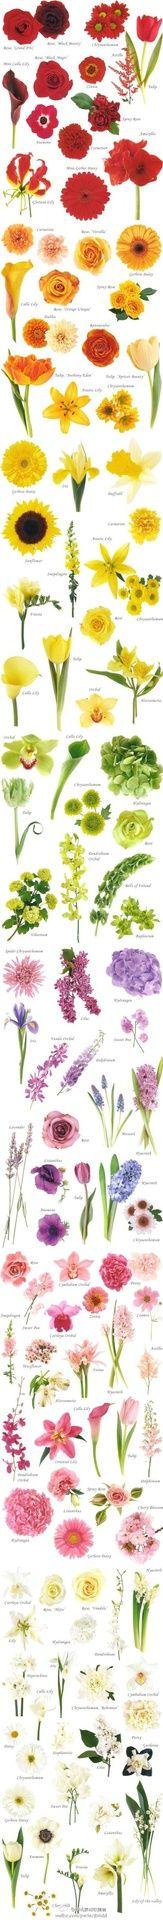 Flower Chart - great Flowers Garden Love